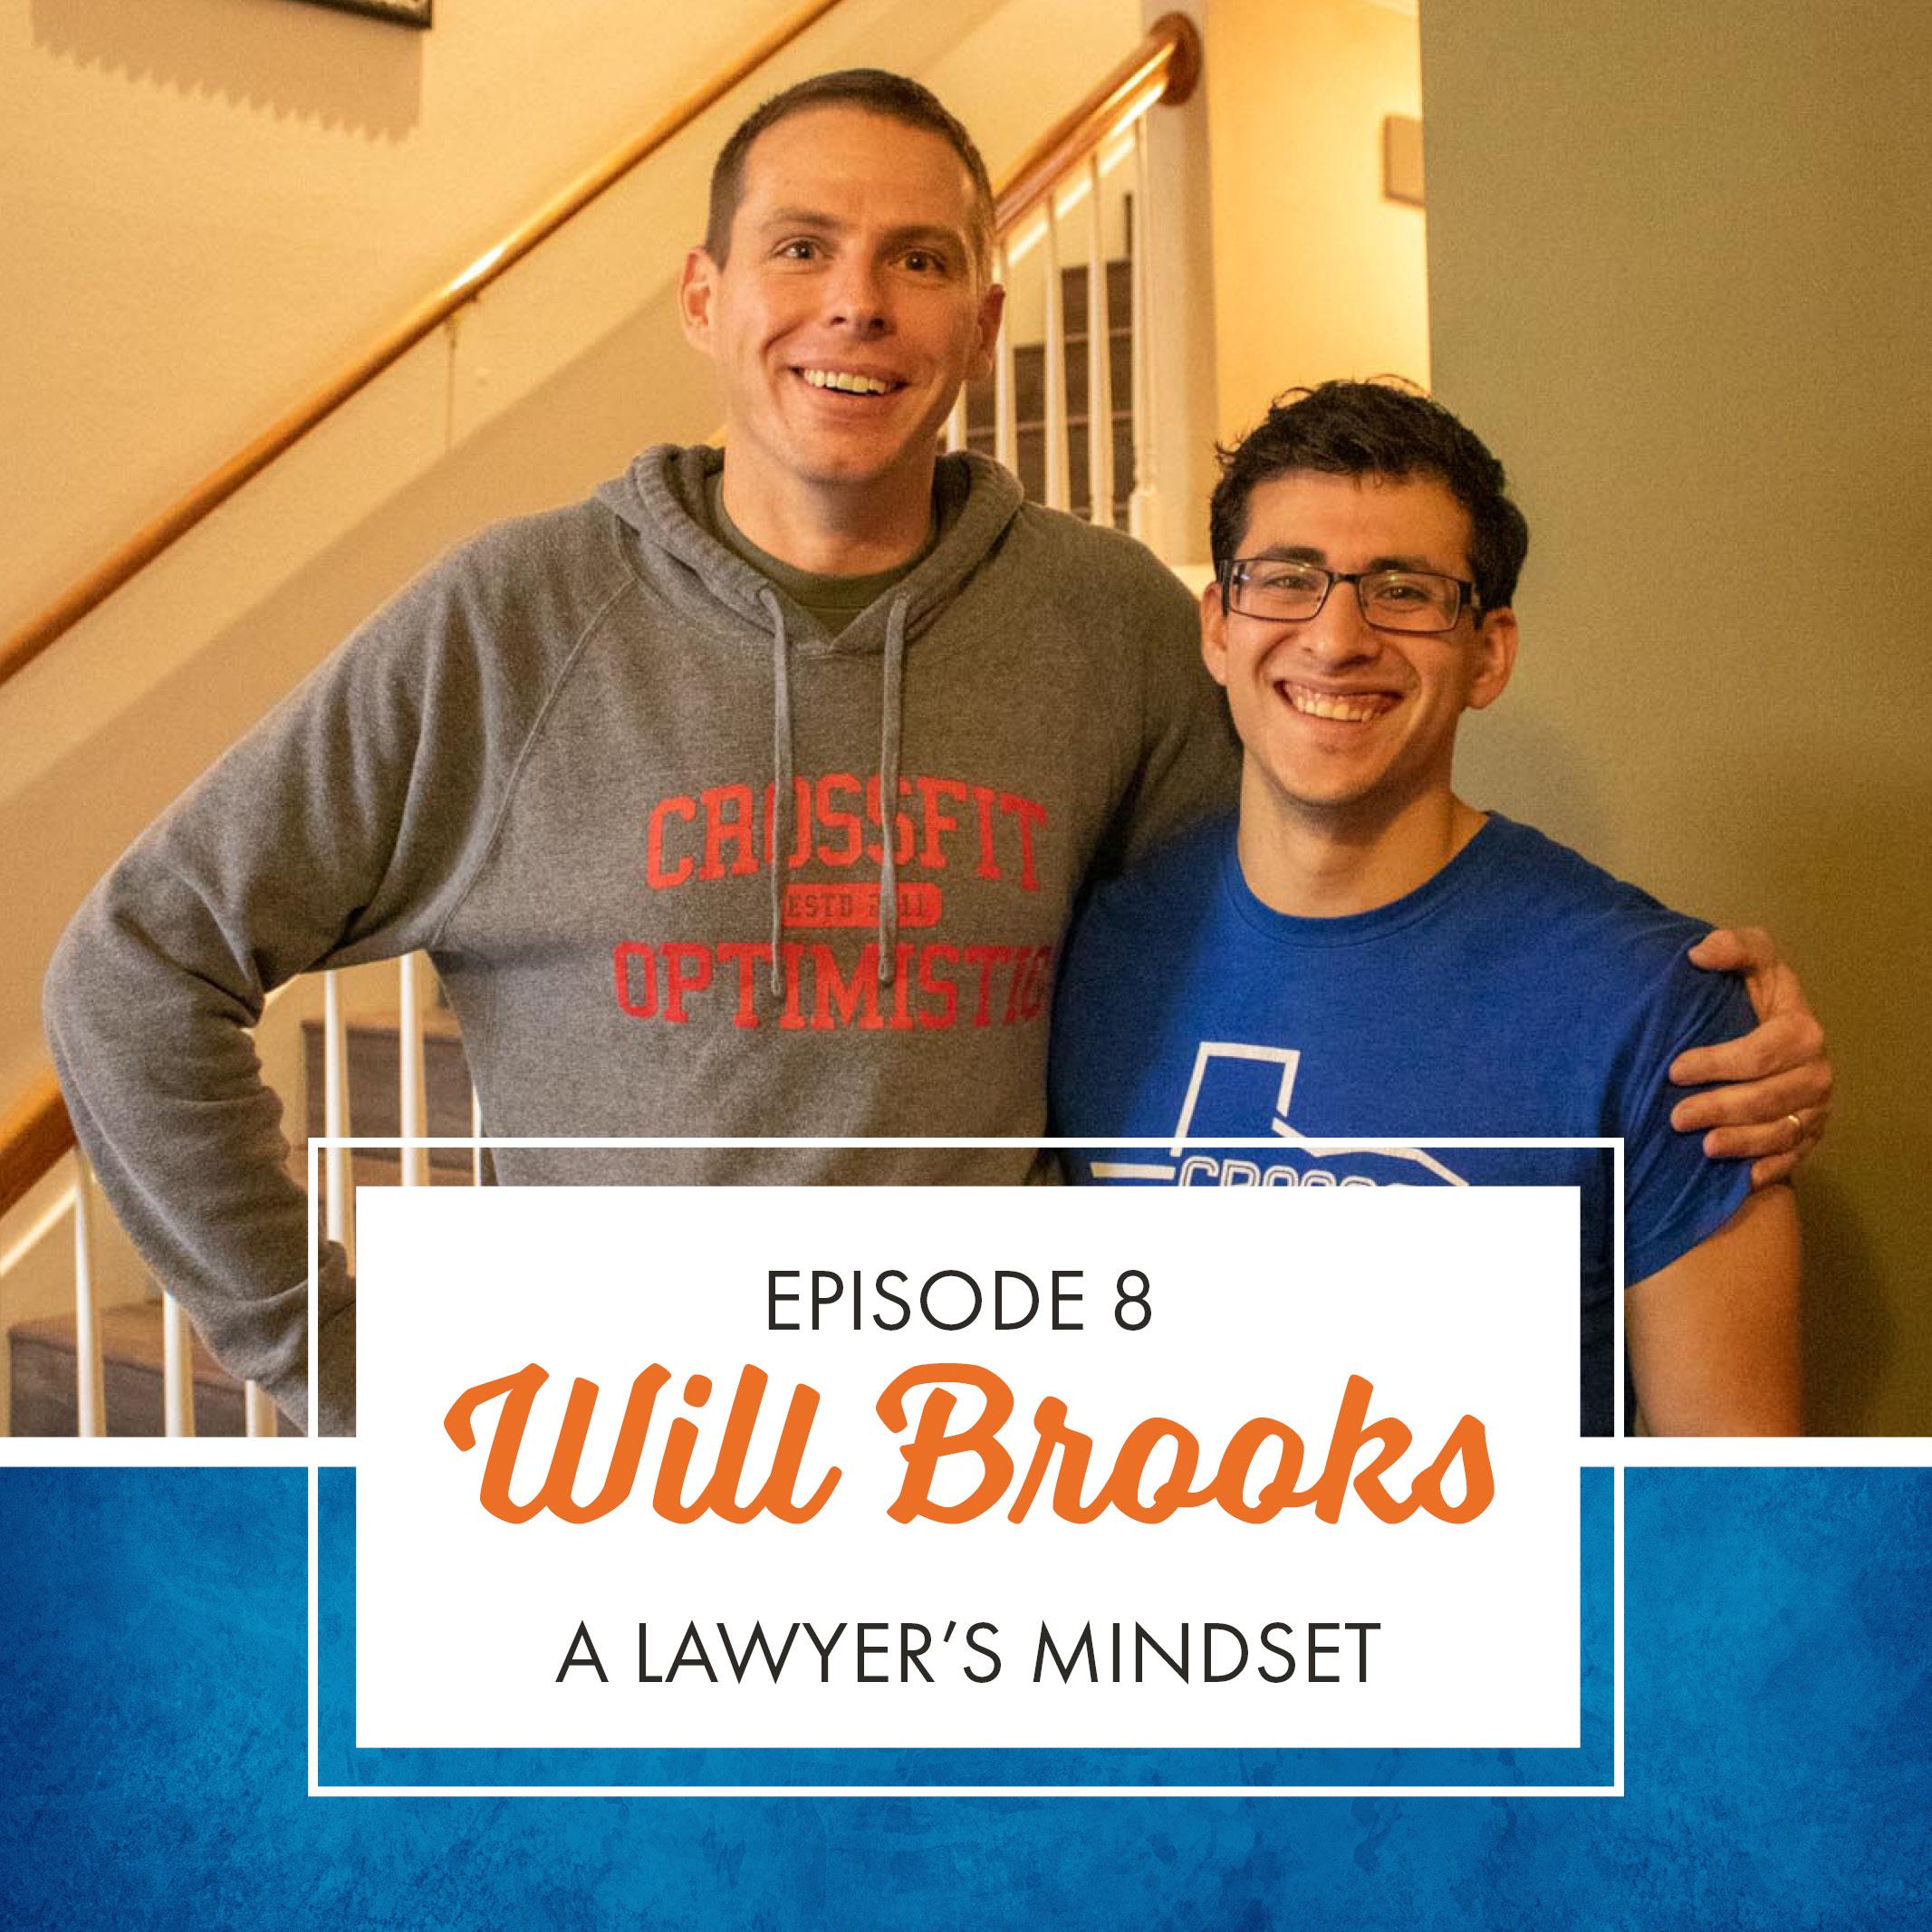 Will Brooks